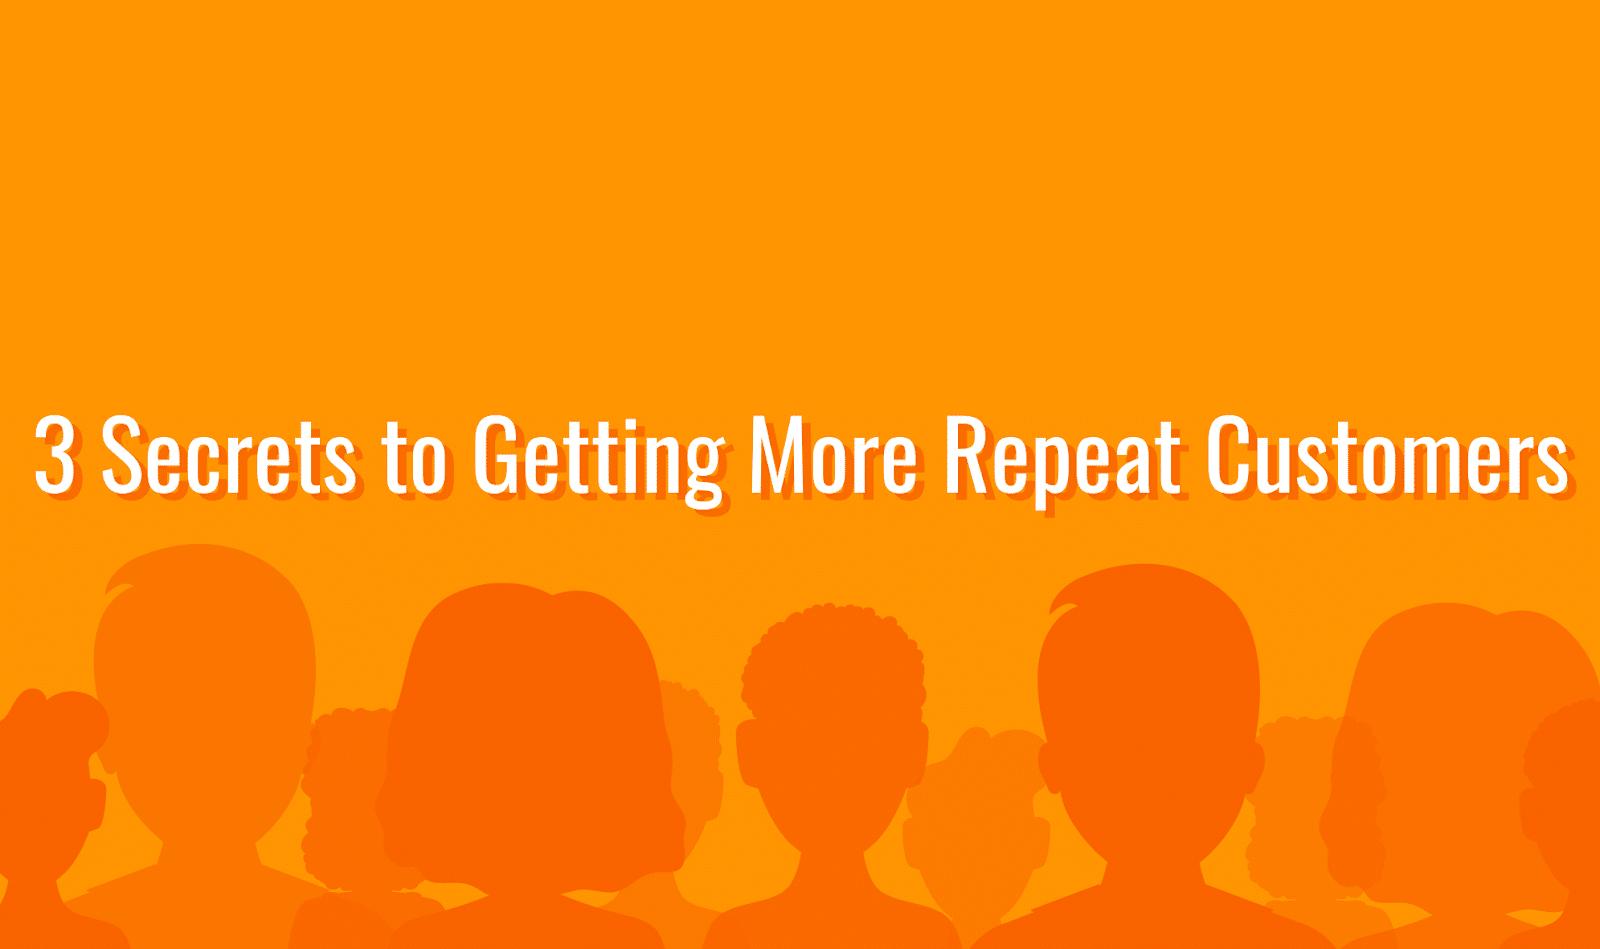 Get More Repeat Customers - Jill's Office - Workiz